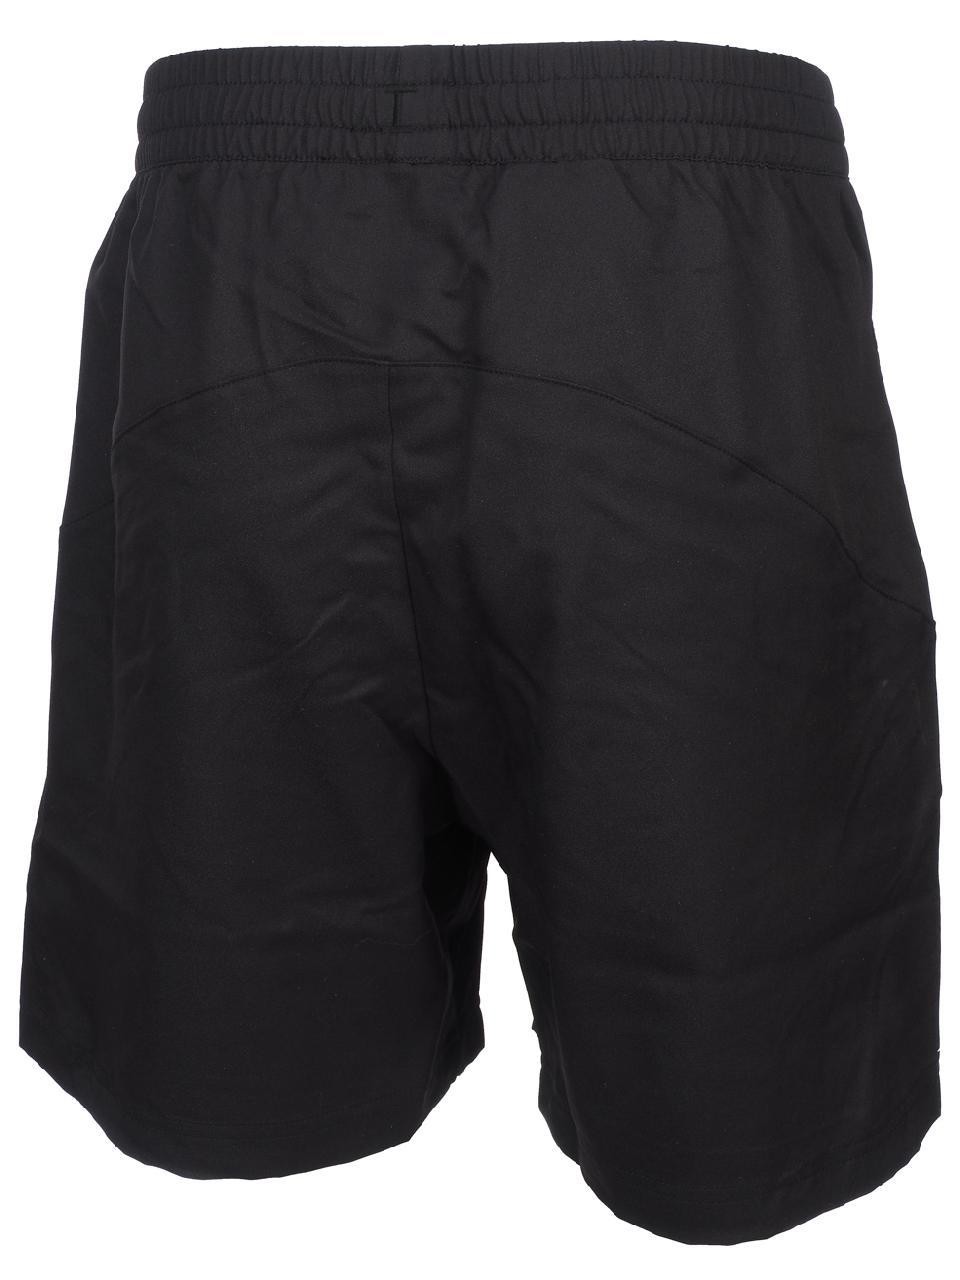 short-Tennis-Babolat-Shorts-Spiel-Core-Blk-Schwarz-70095-Neu Indexbild 5